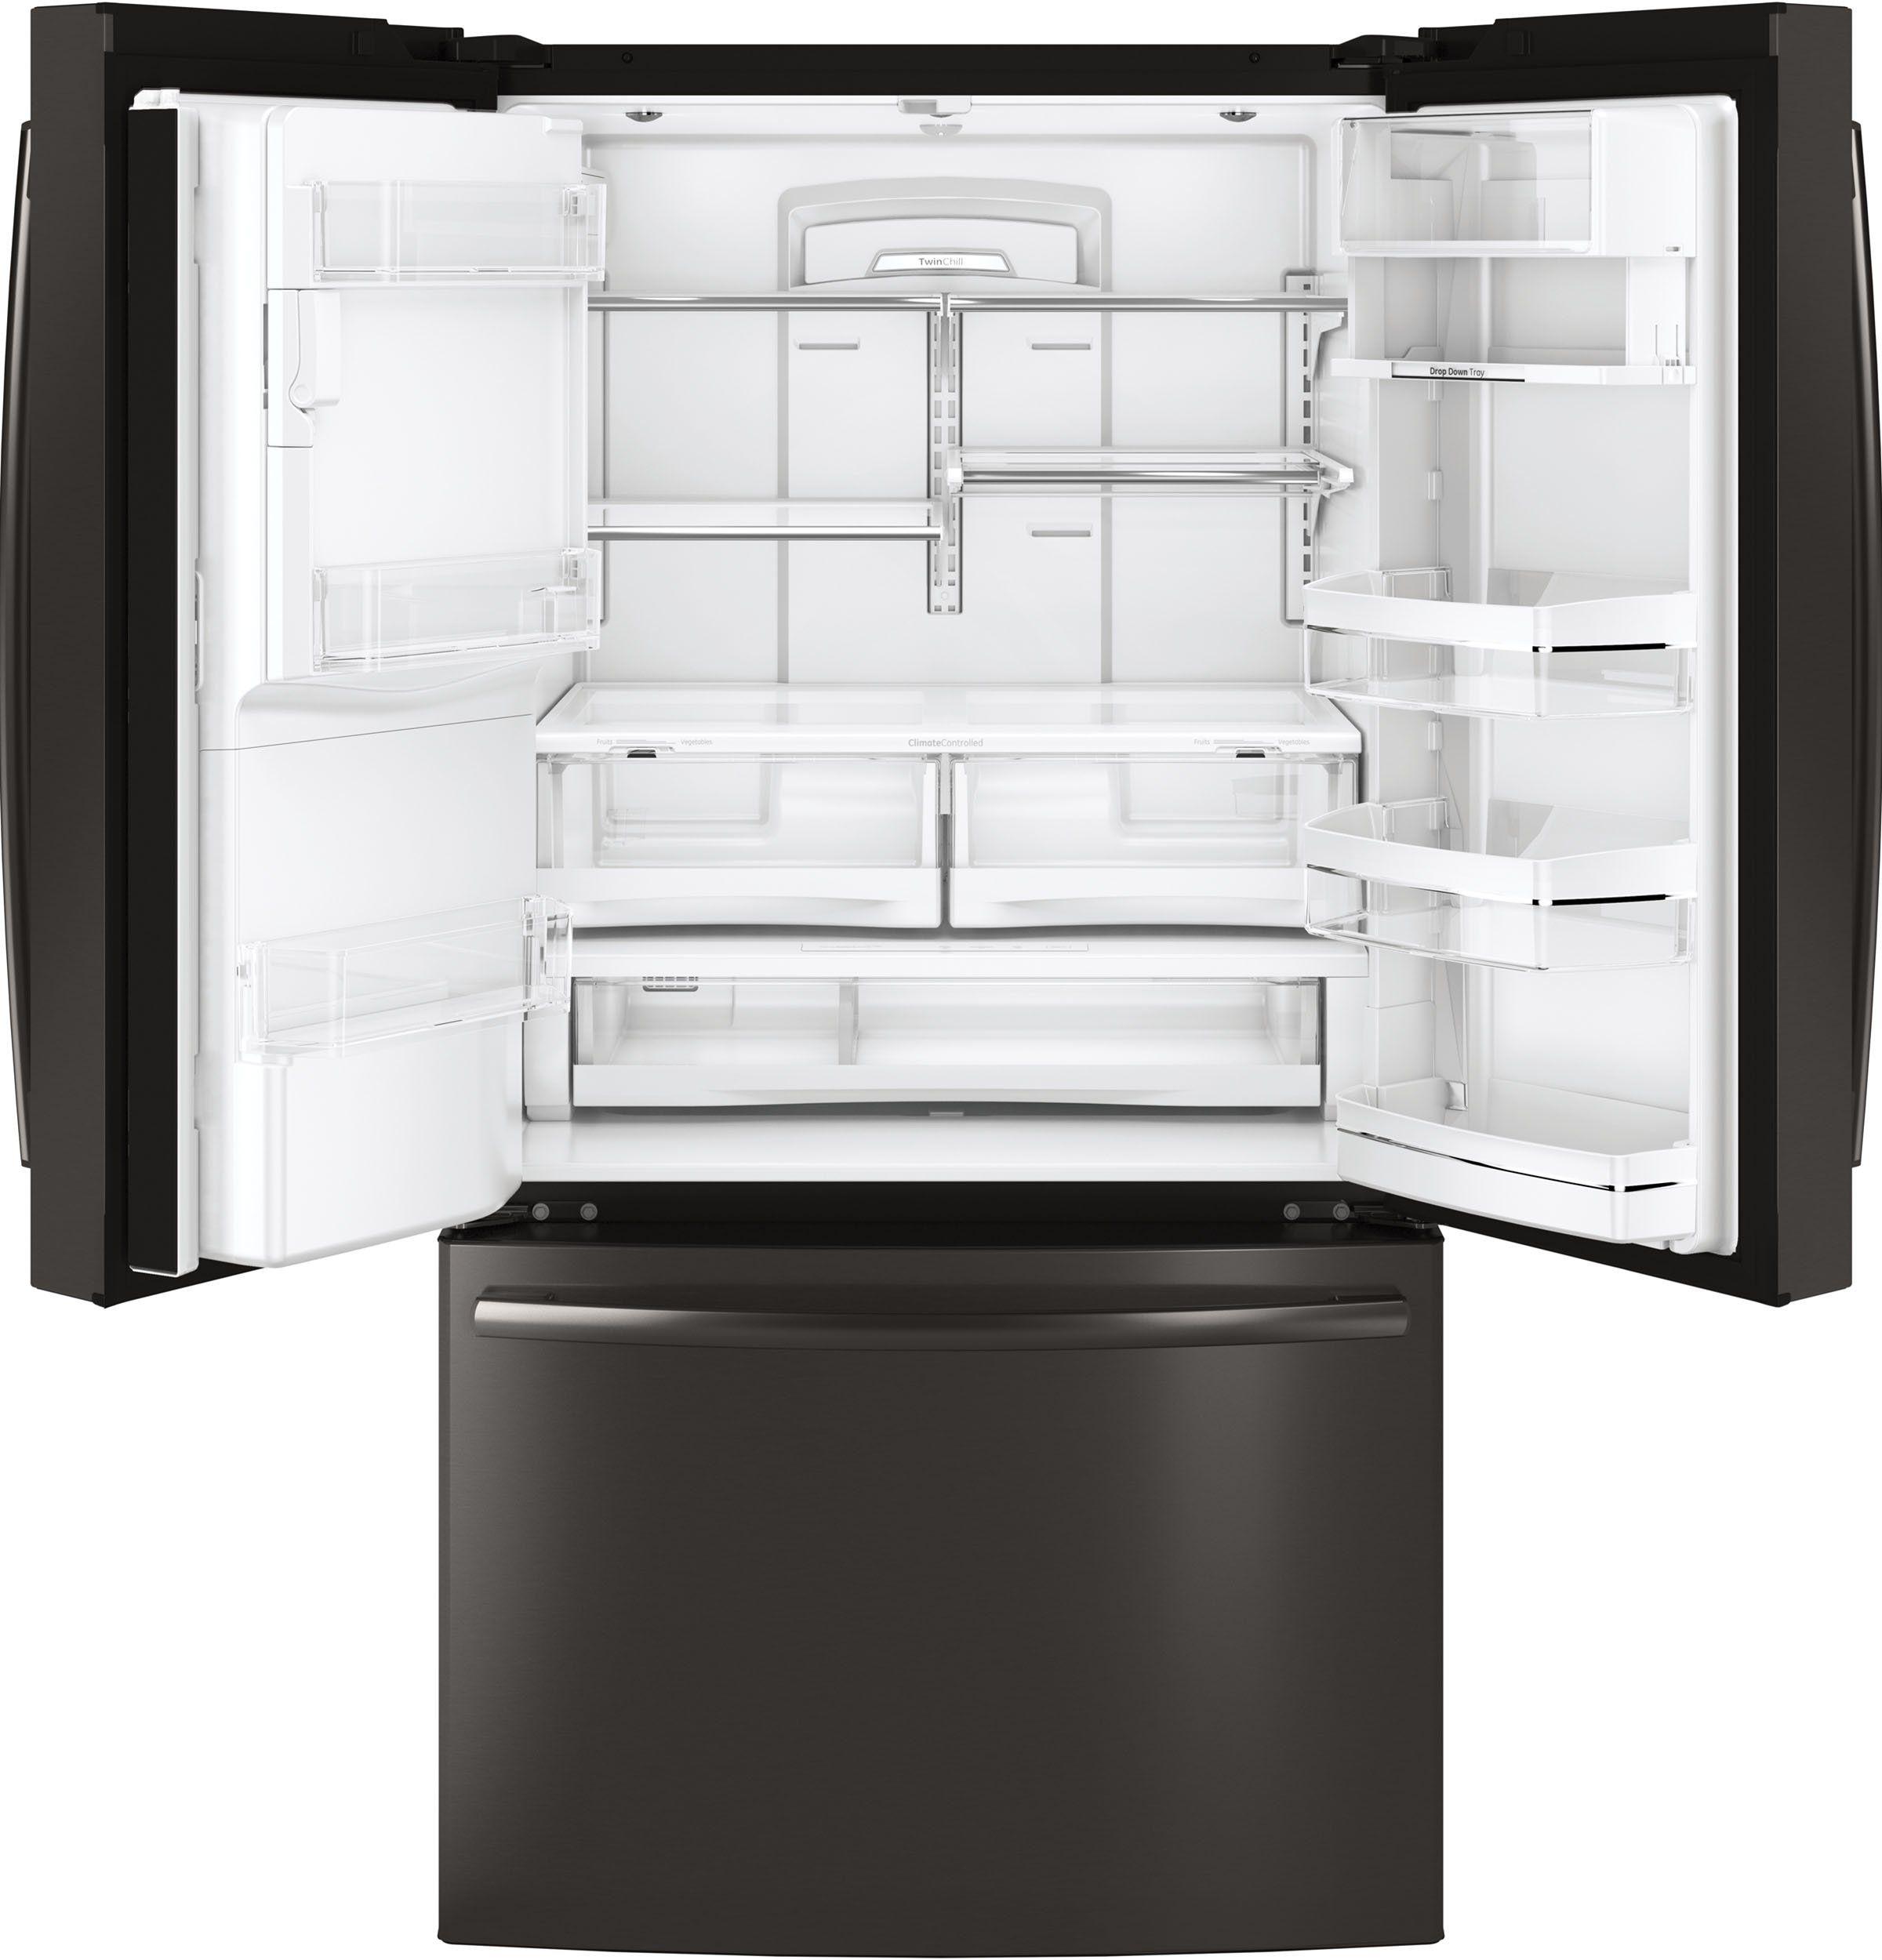 Ge Profile 36 Inch French Door Refrigerator 27 8 Cu Ft Black